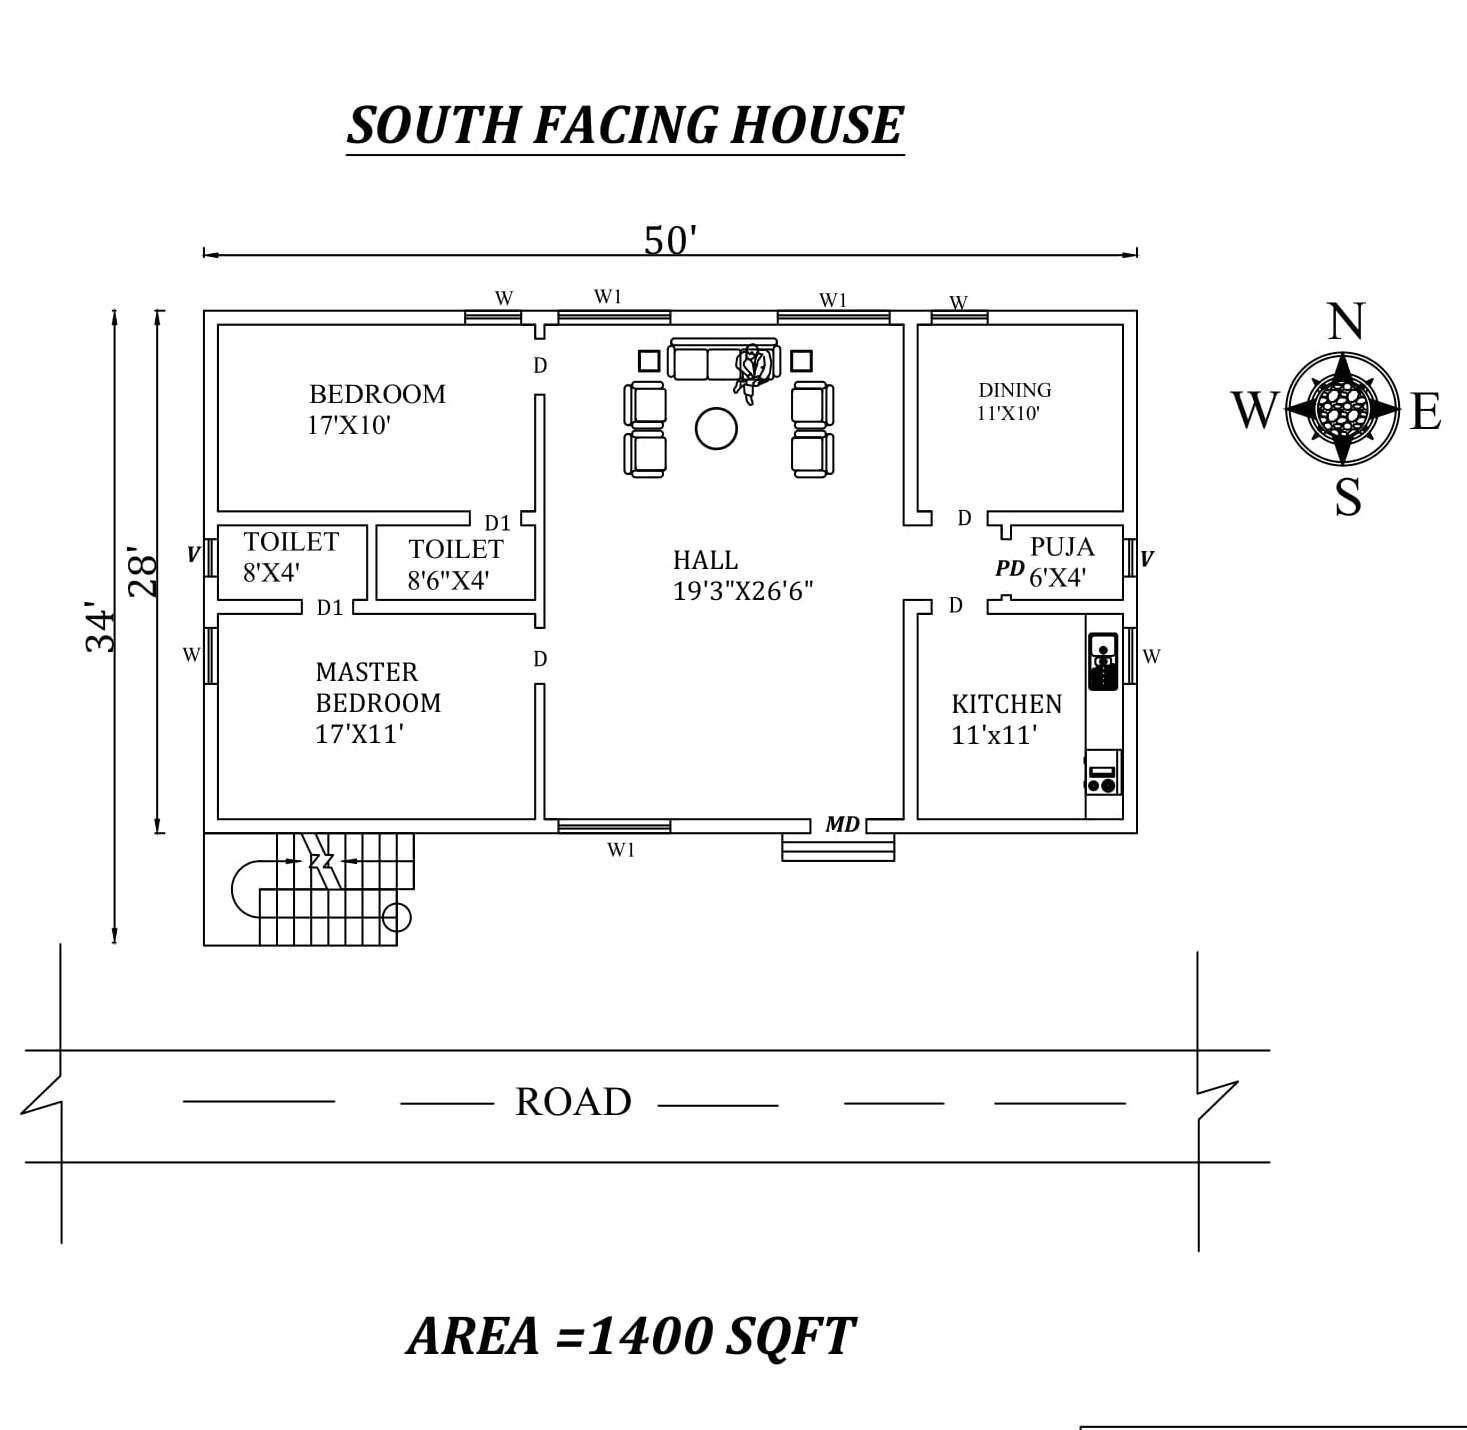 50 x34 2BHK South Facing House Plan As Per Vastu Shastra Cad Drawing File details